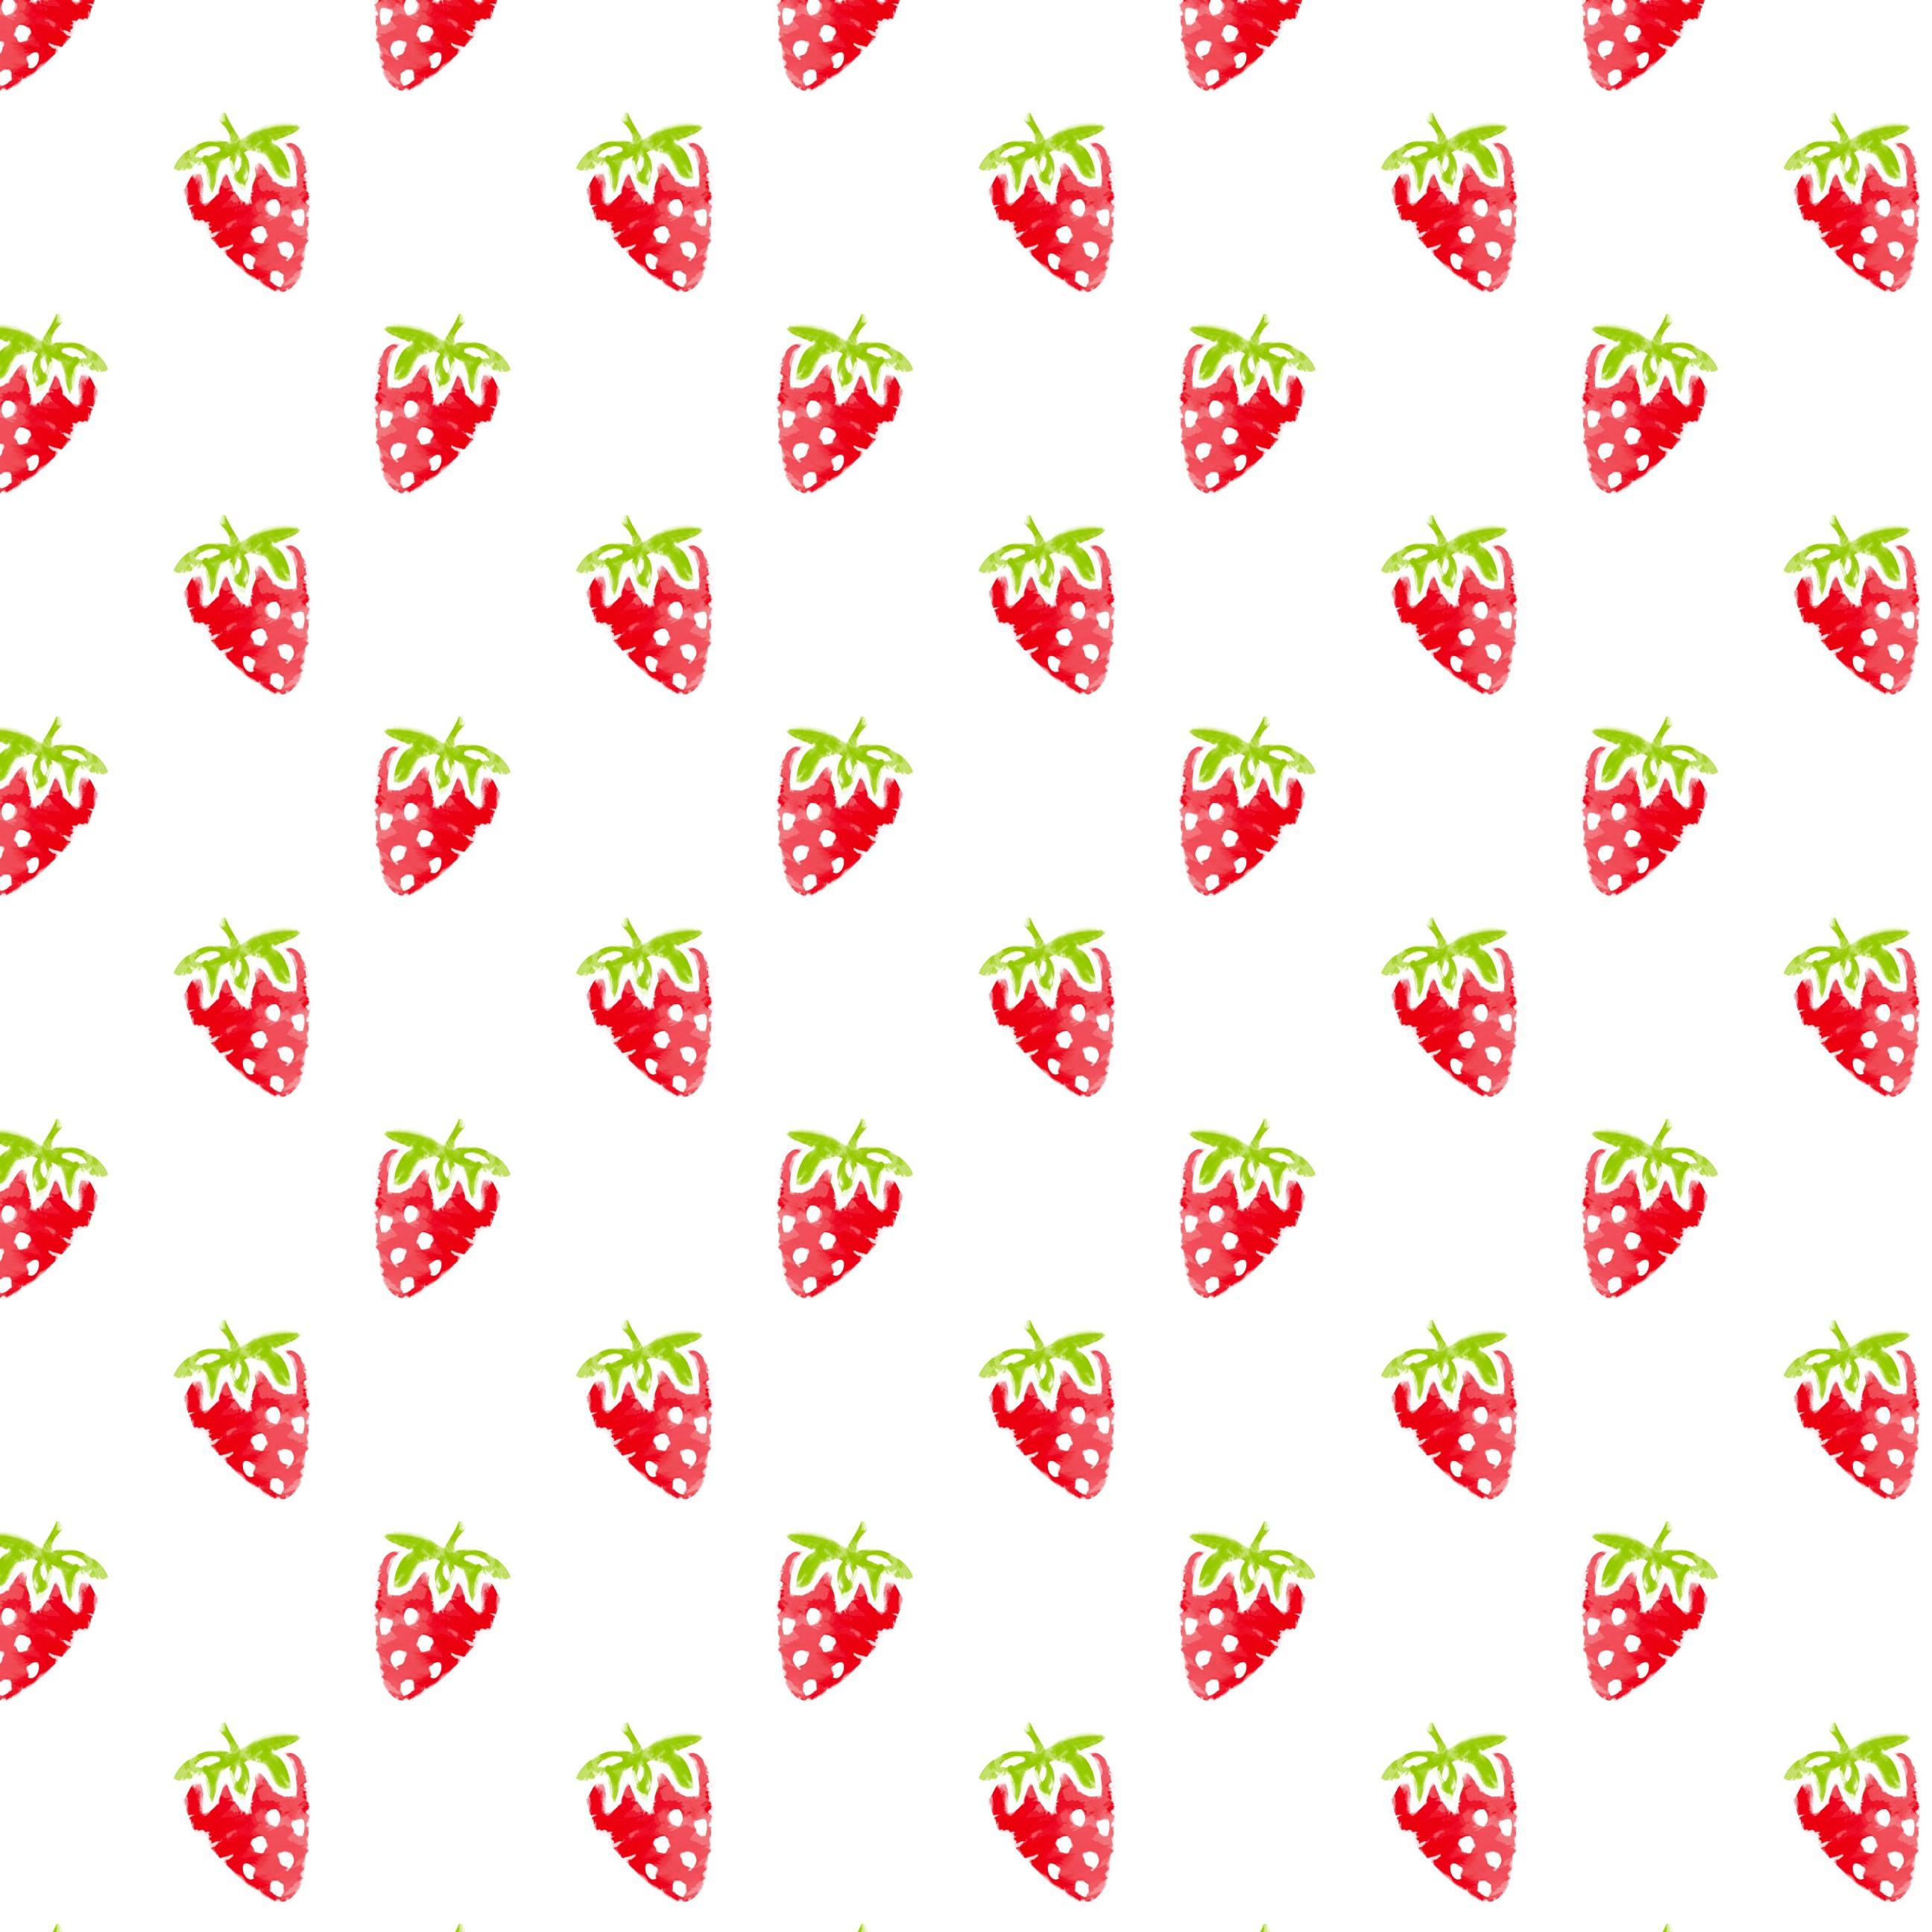 kawaii strawberry wallpaper vintage - photo #24